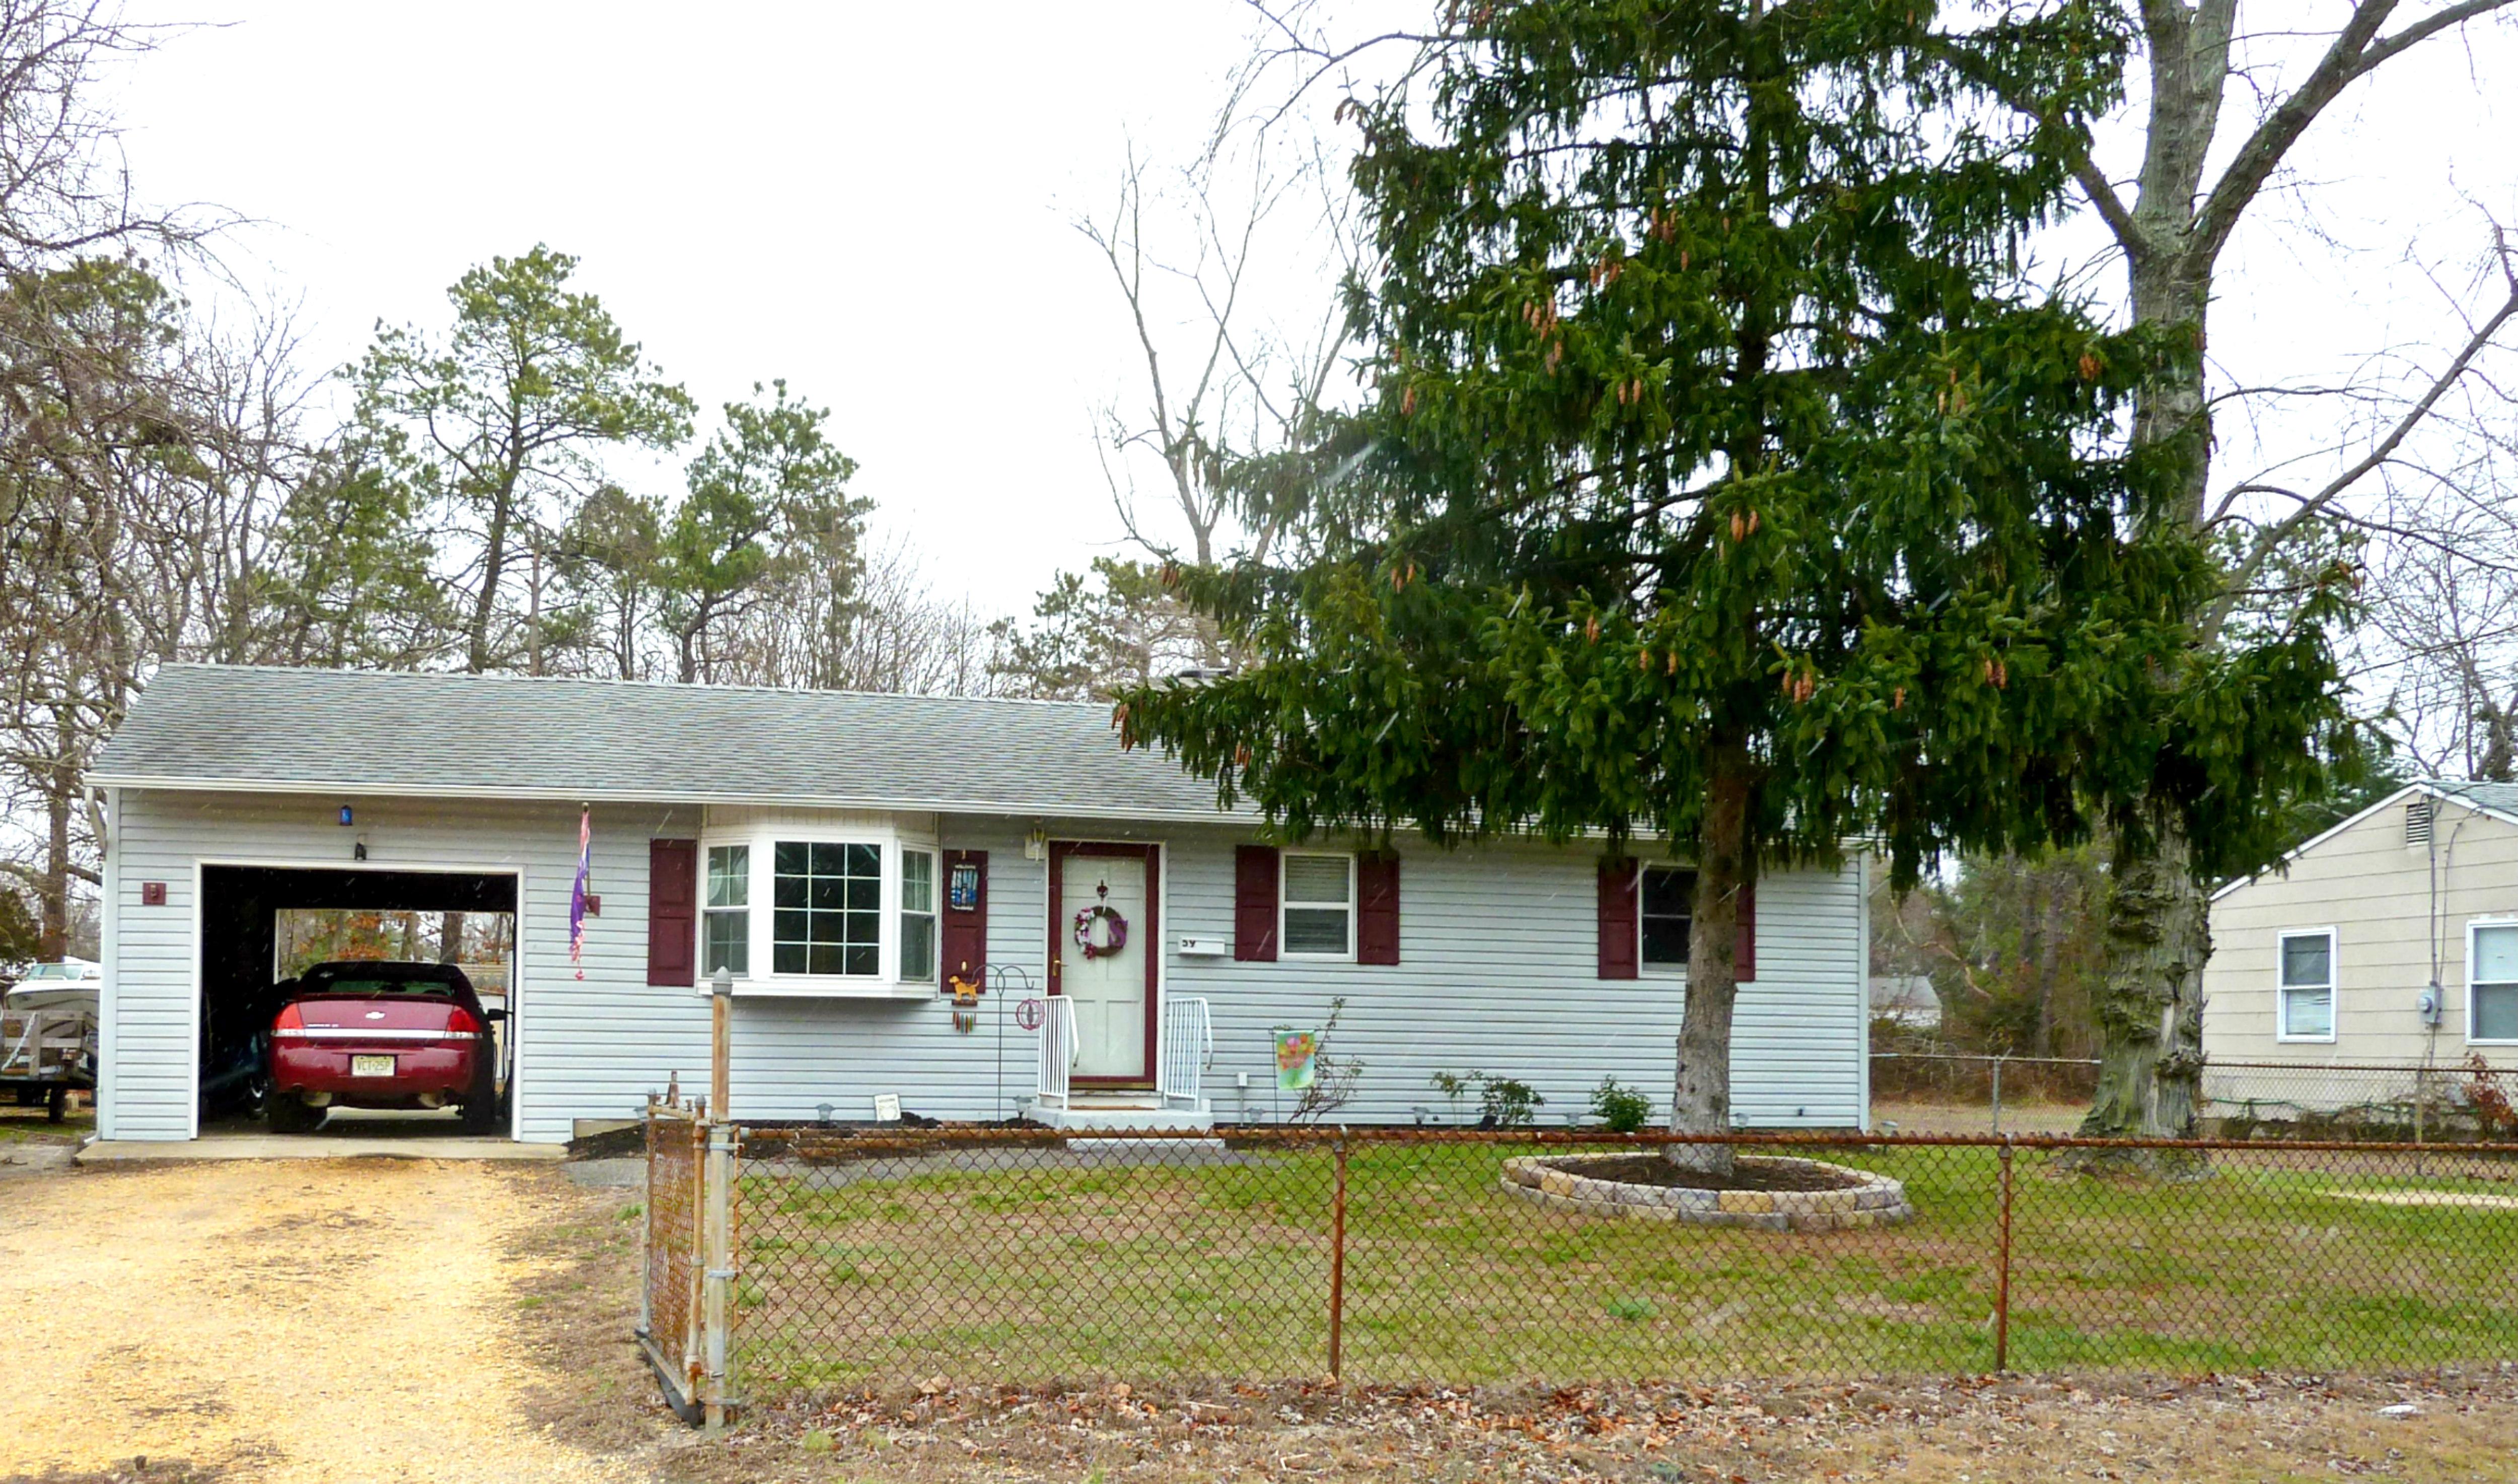 59 Maplewood Dr., Brick, New Jersey 08723